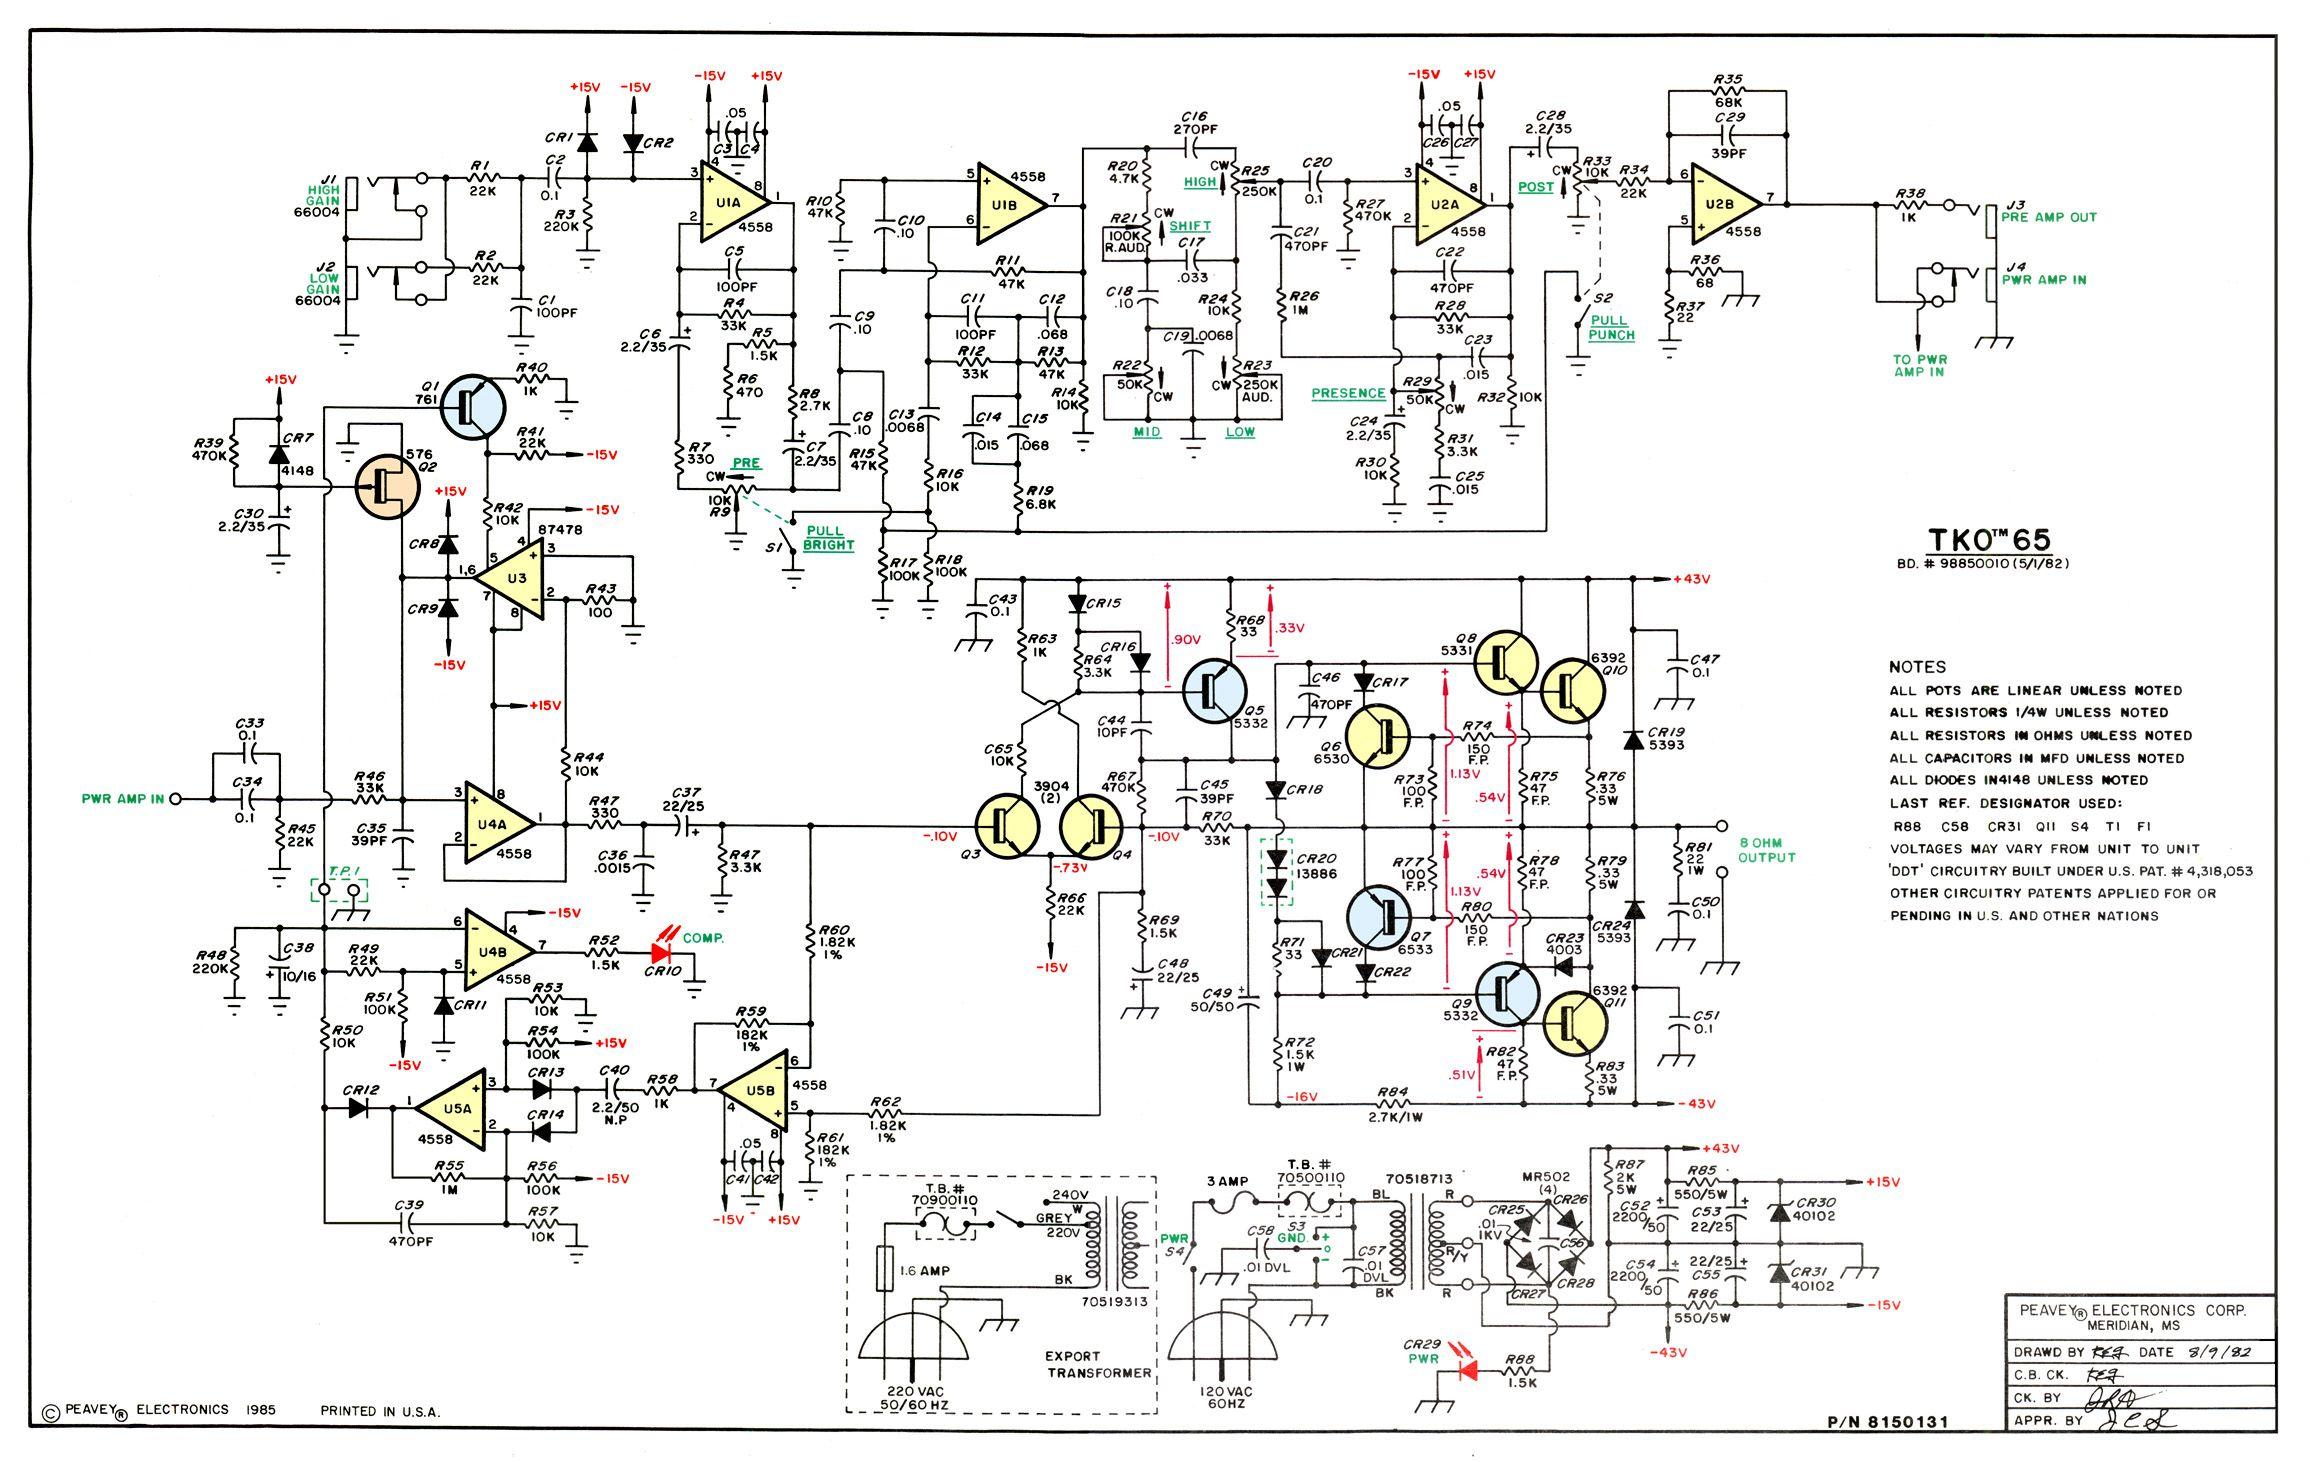 peavey tko 65 amplifier blueprints wiring diagrams mods rh pinterest com